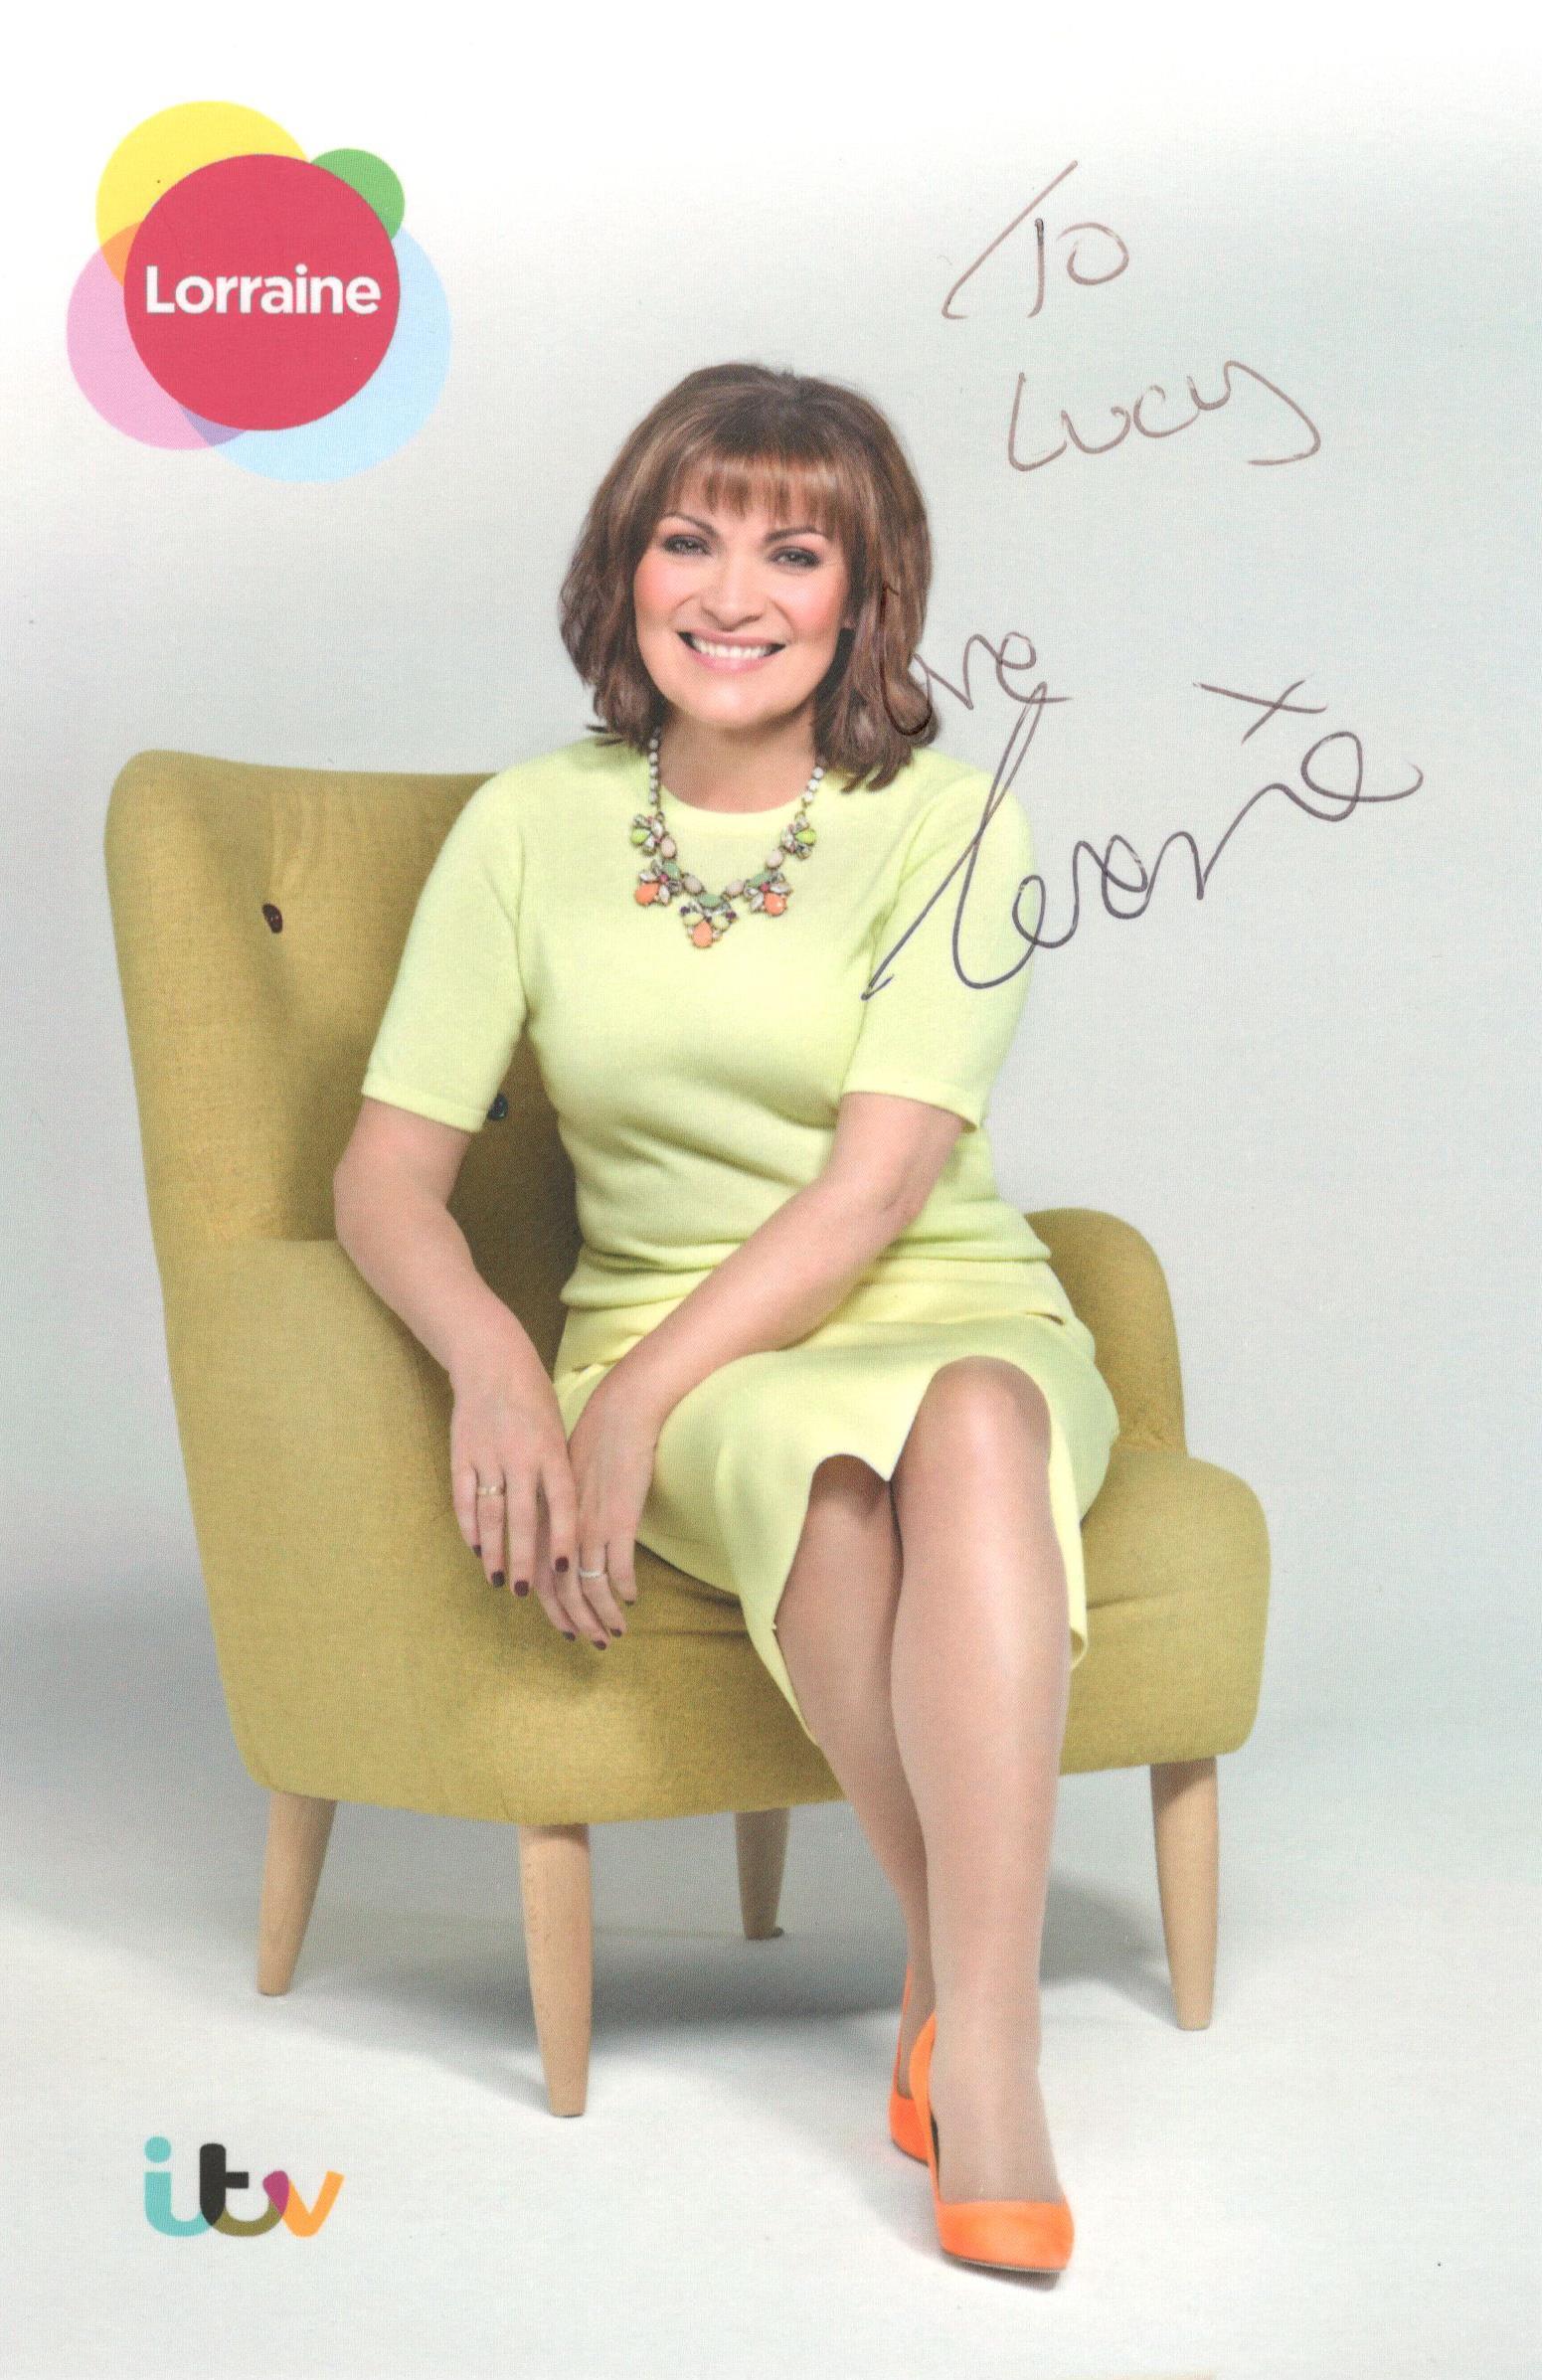 Card from Lorraine Kelly.jpg